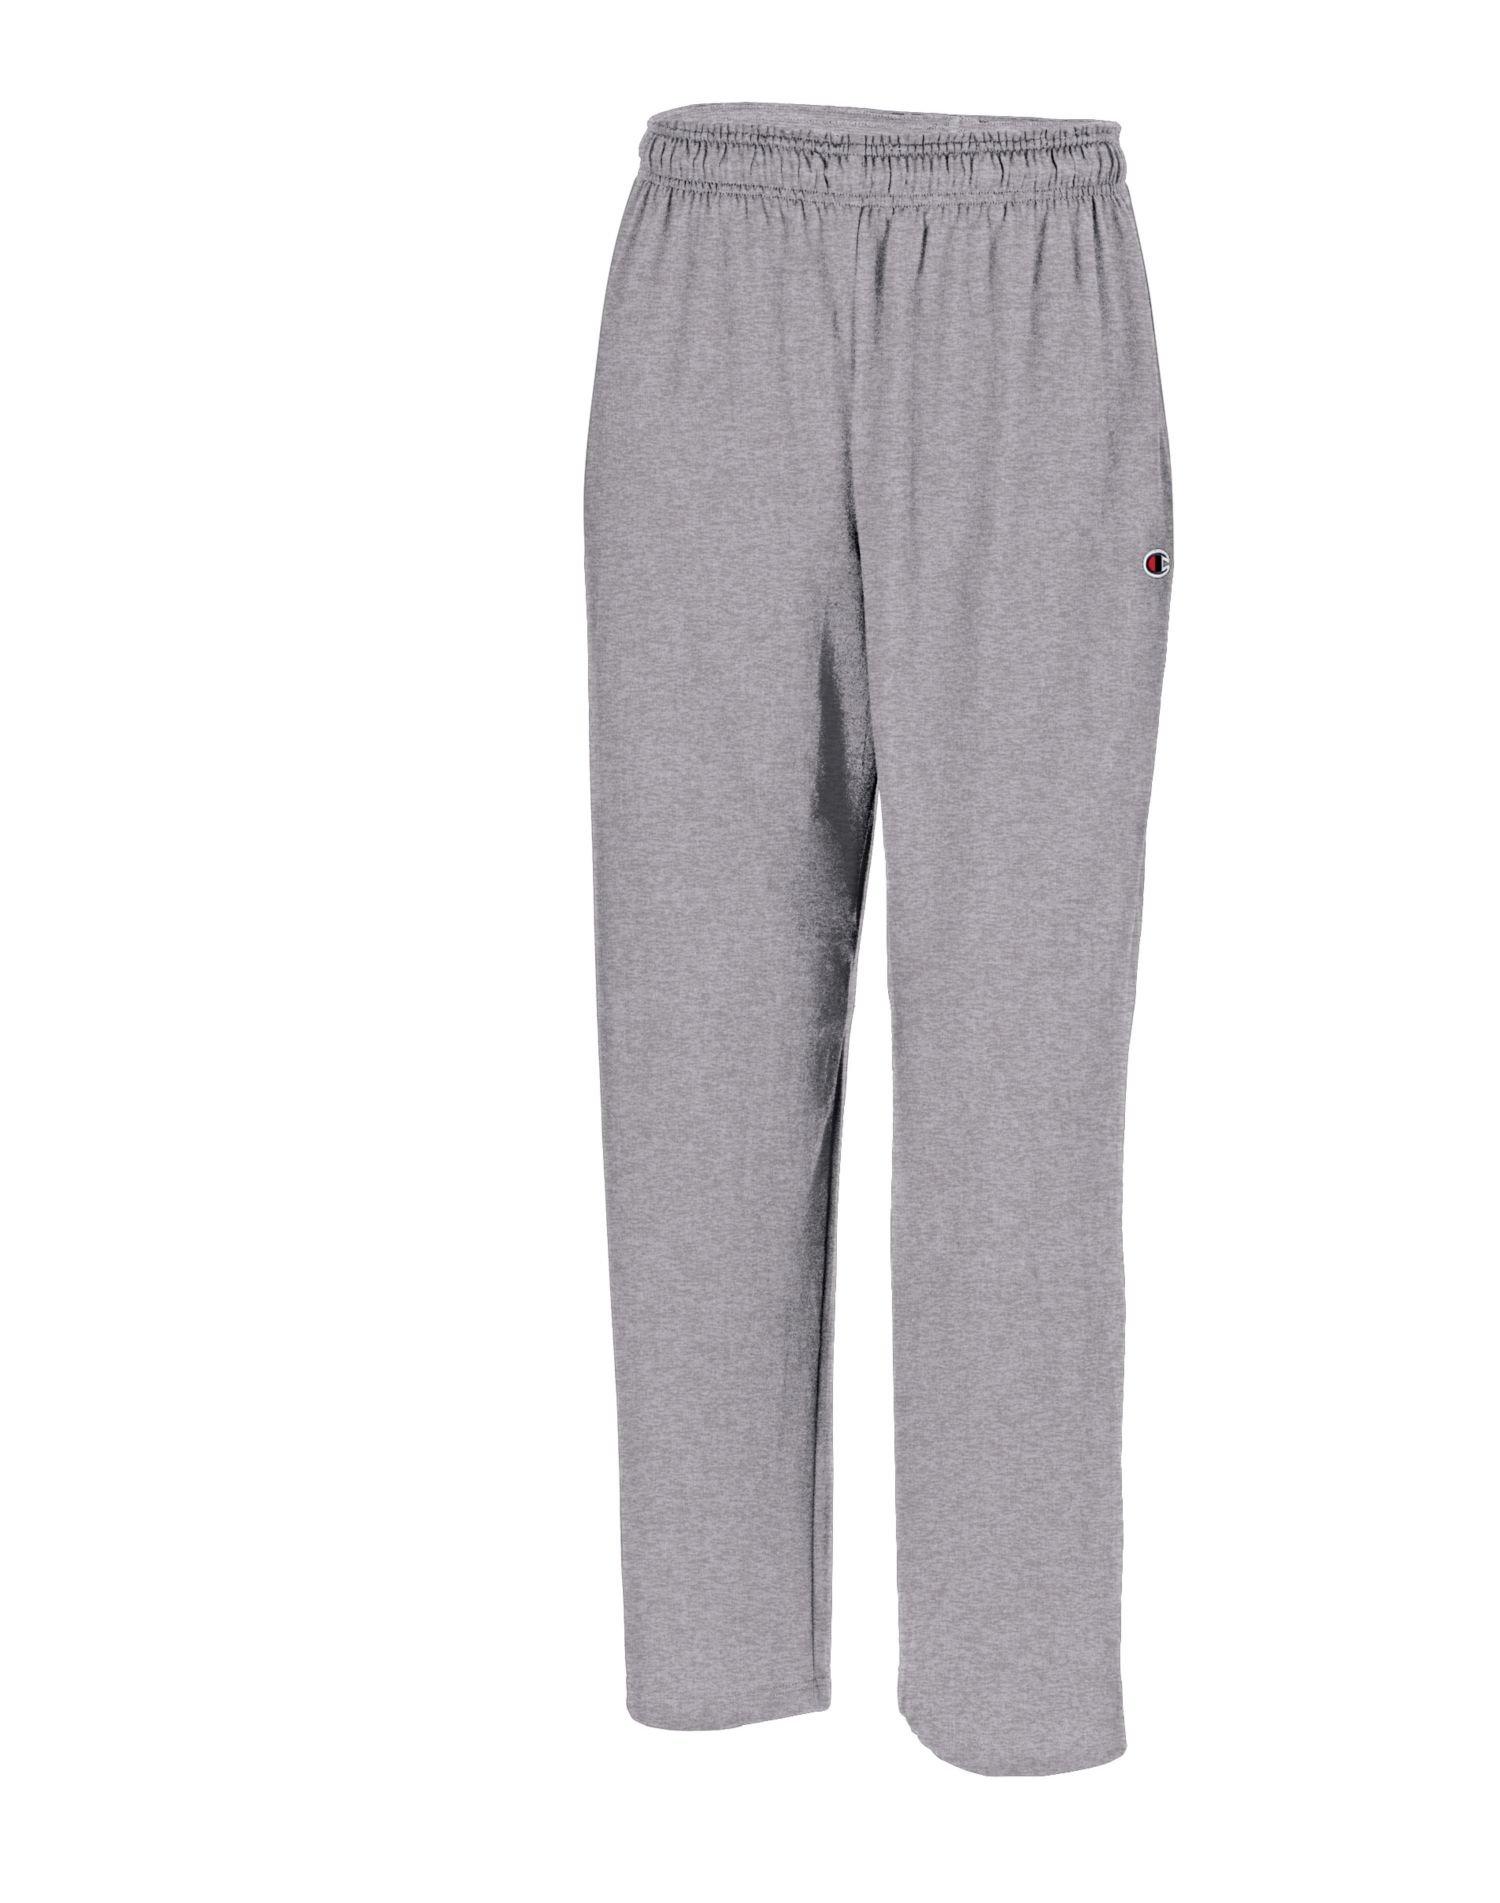 Champion Men's Classic Jersey Open Bottom Pants Oxford Gray X-Large 32.5